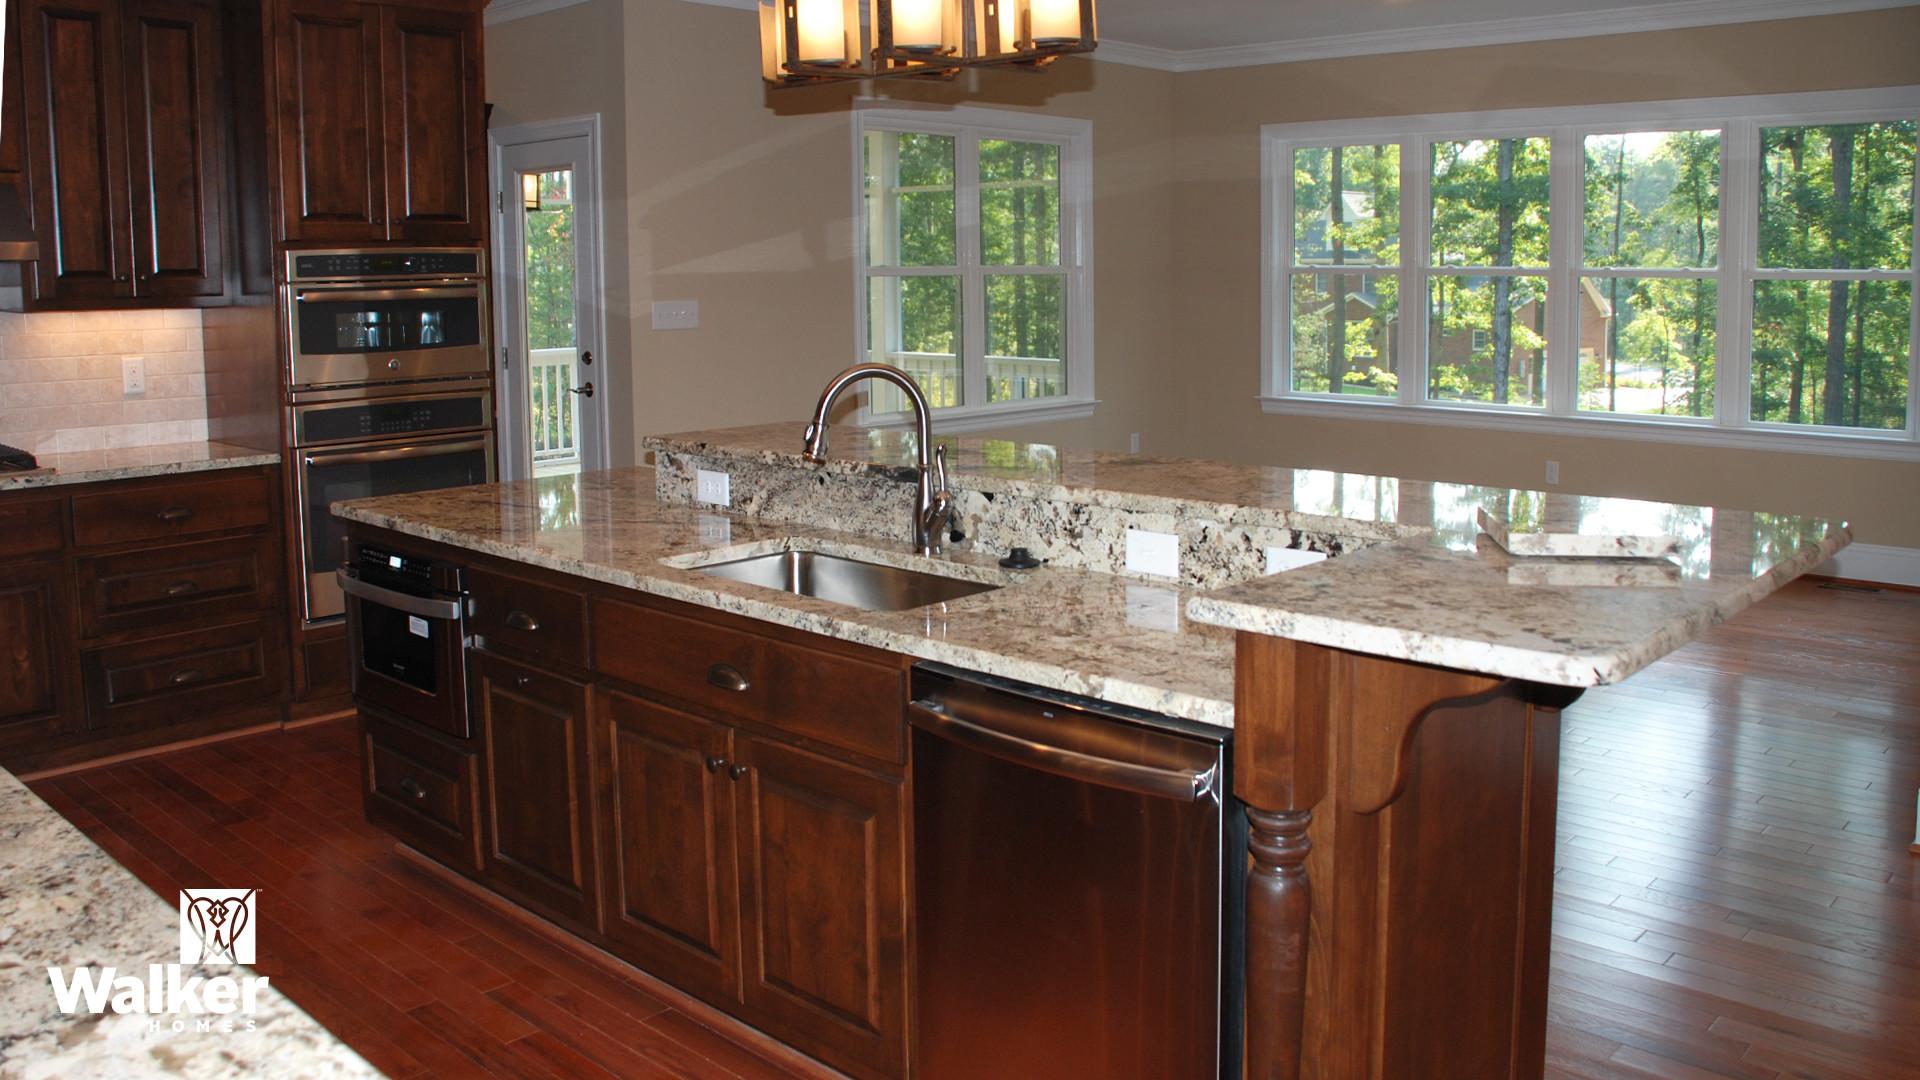 A Kitchen from a custom home design by Walker Homes in Glen Allen, Virginia